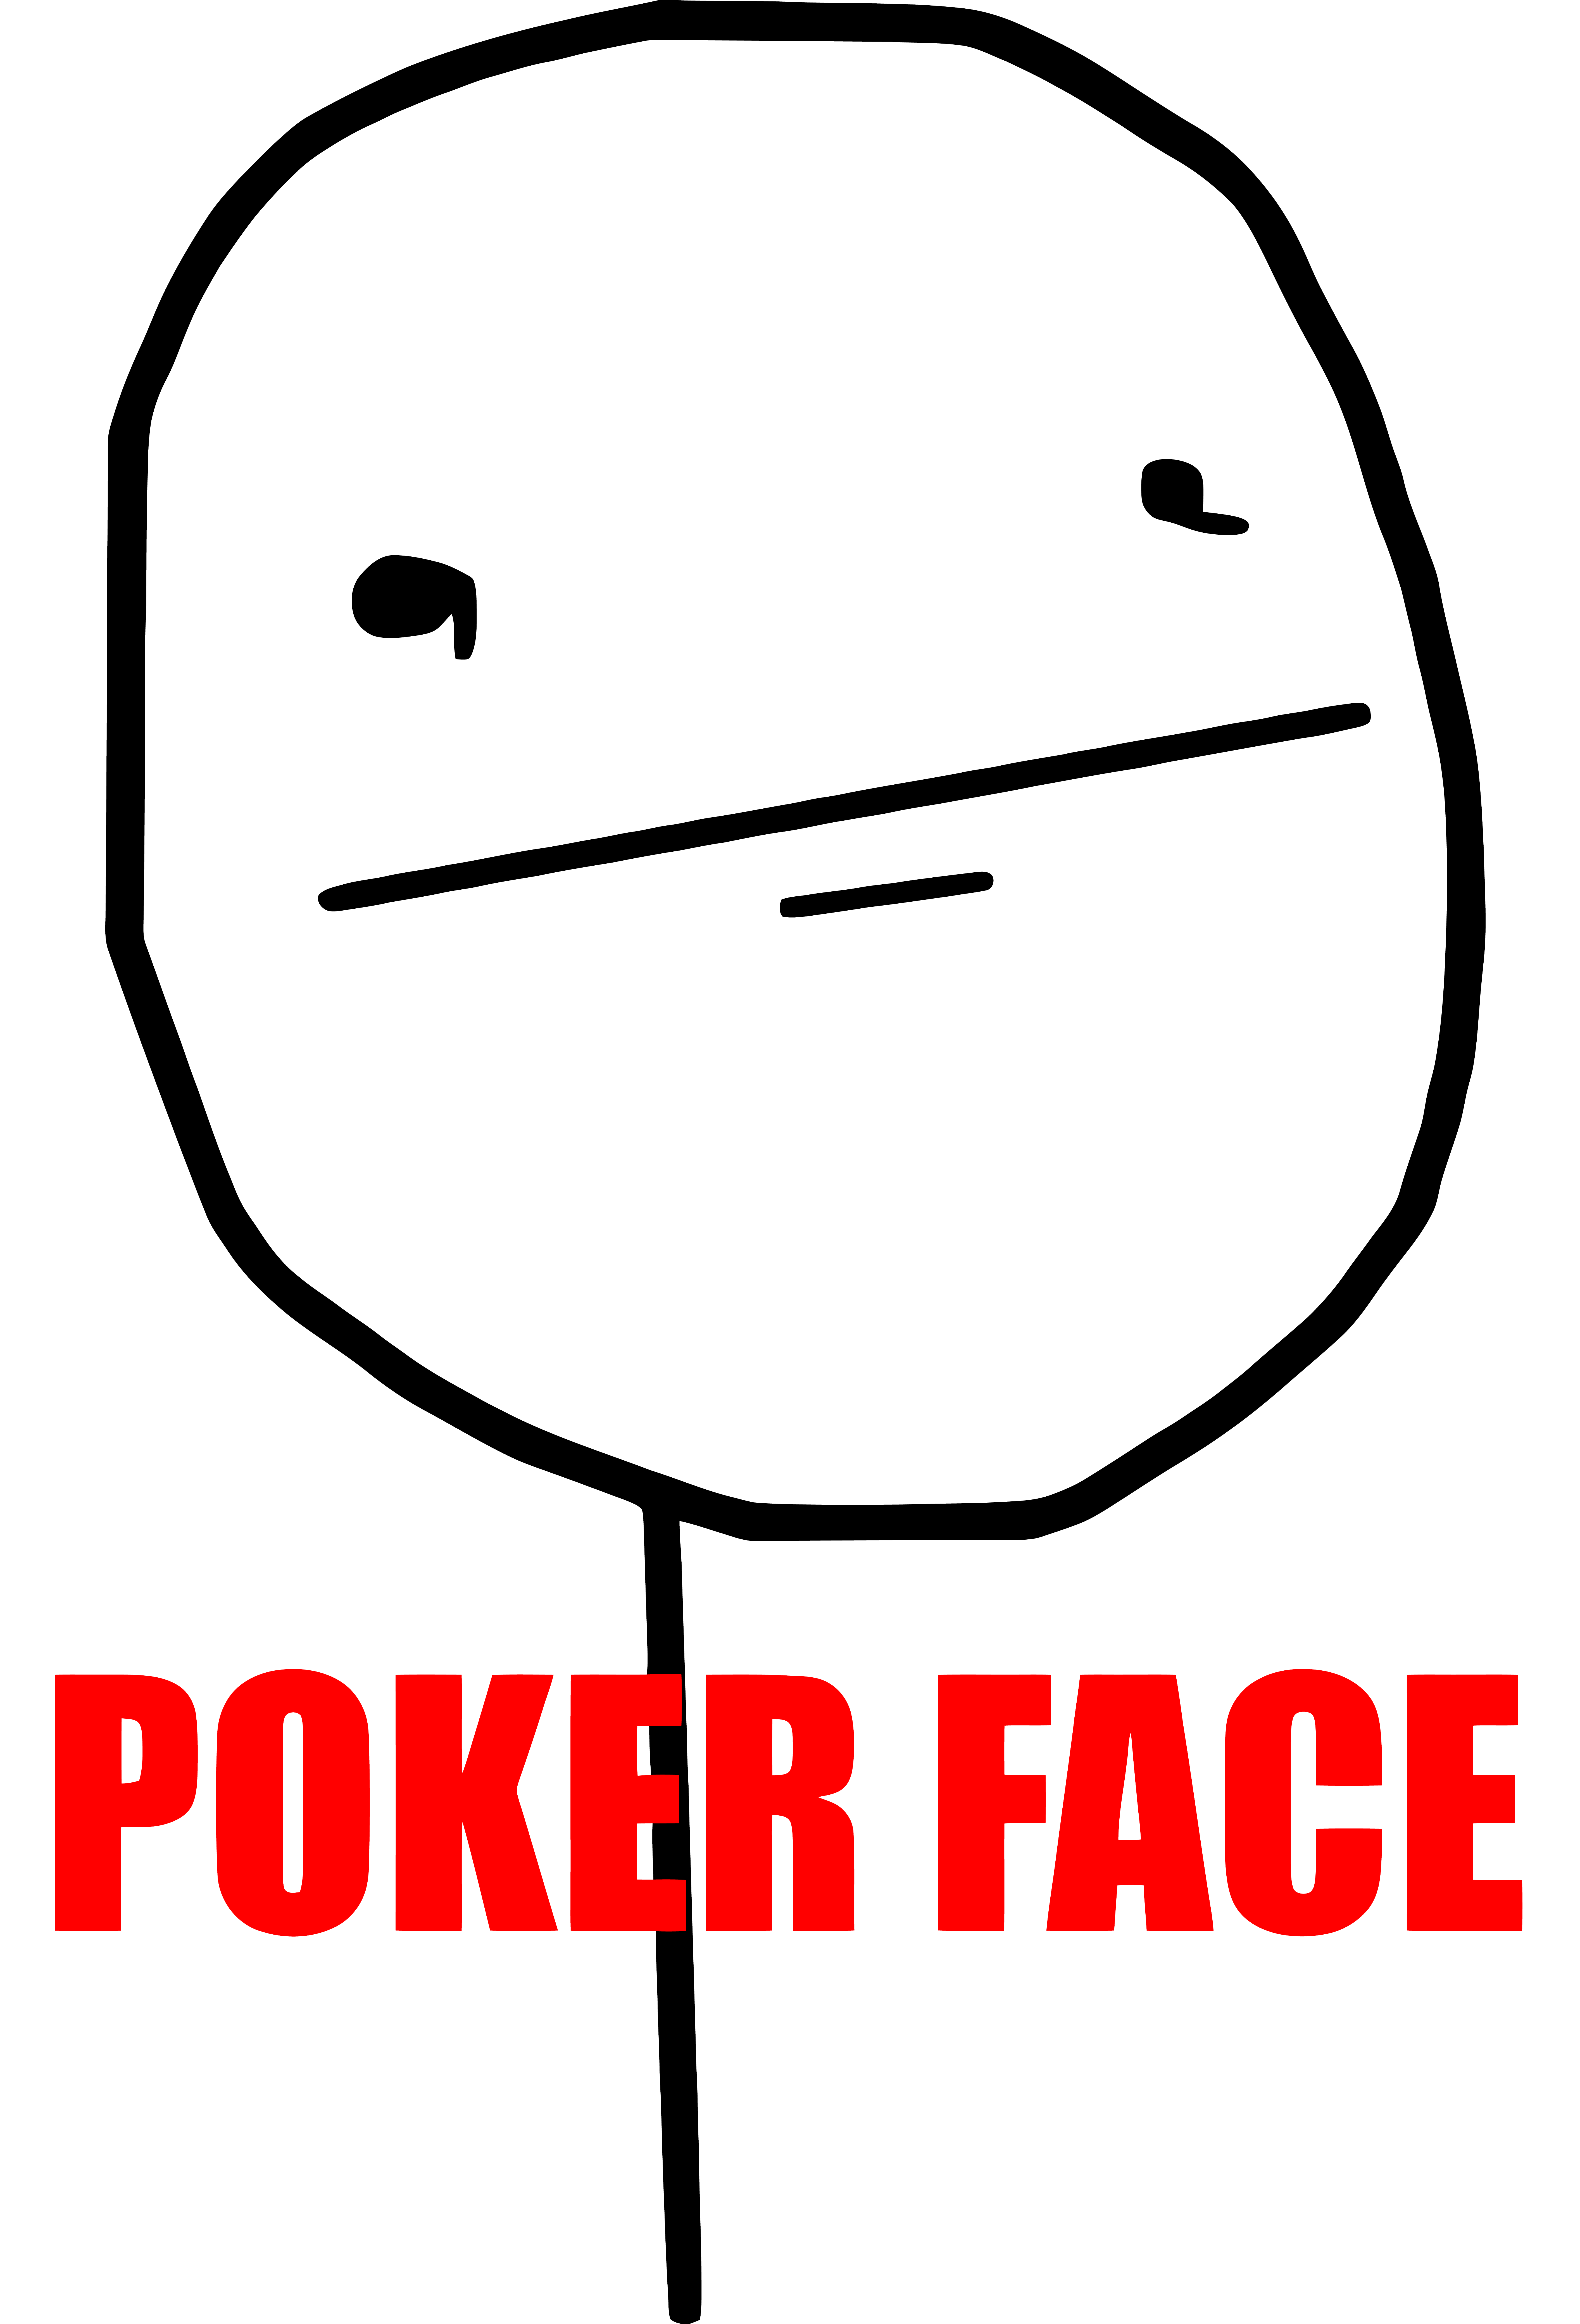 Poker Face by Rober-Raik